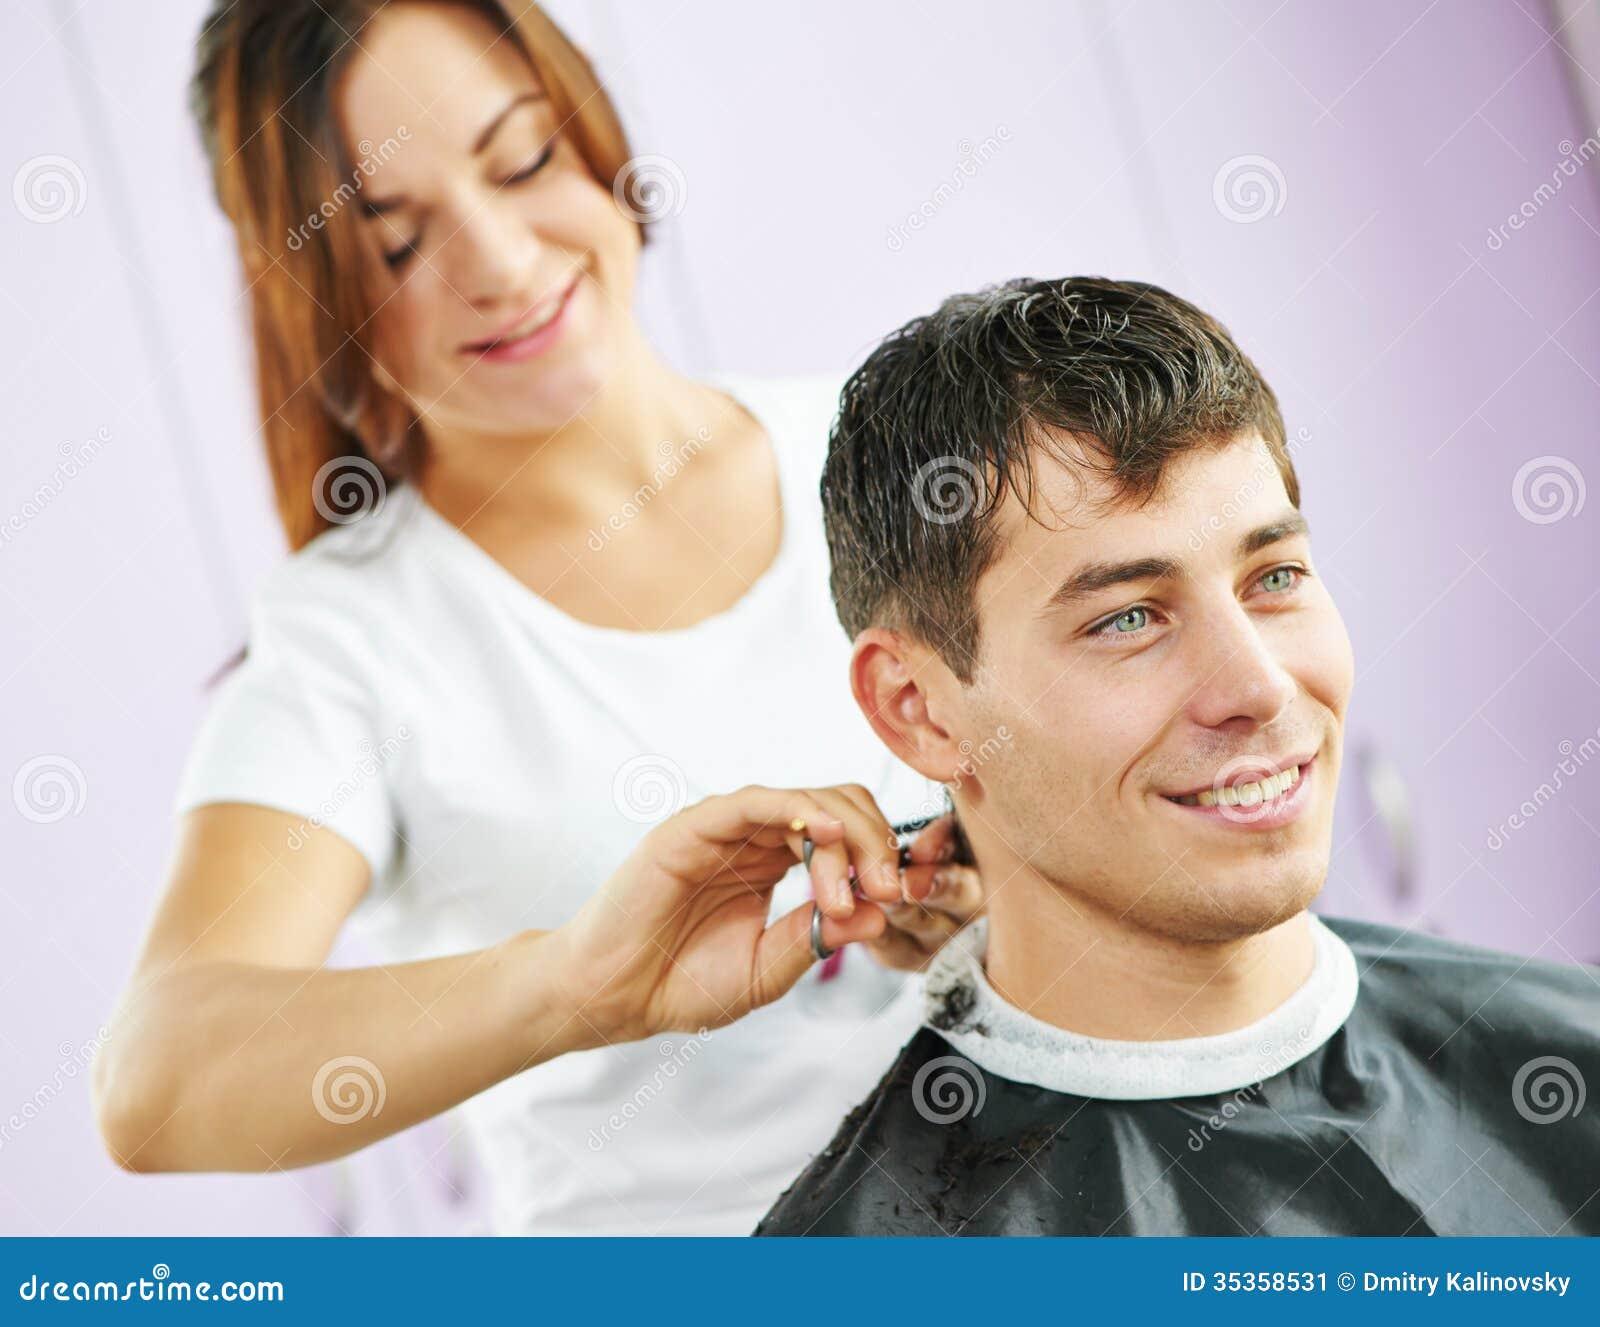 Best 25 Barber haircuts ideas on Pinterest  Side swept